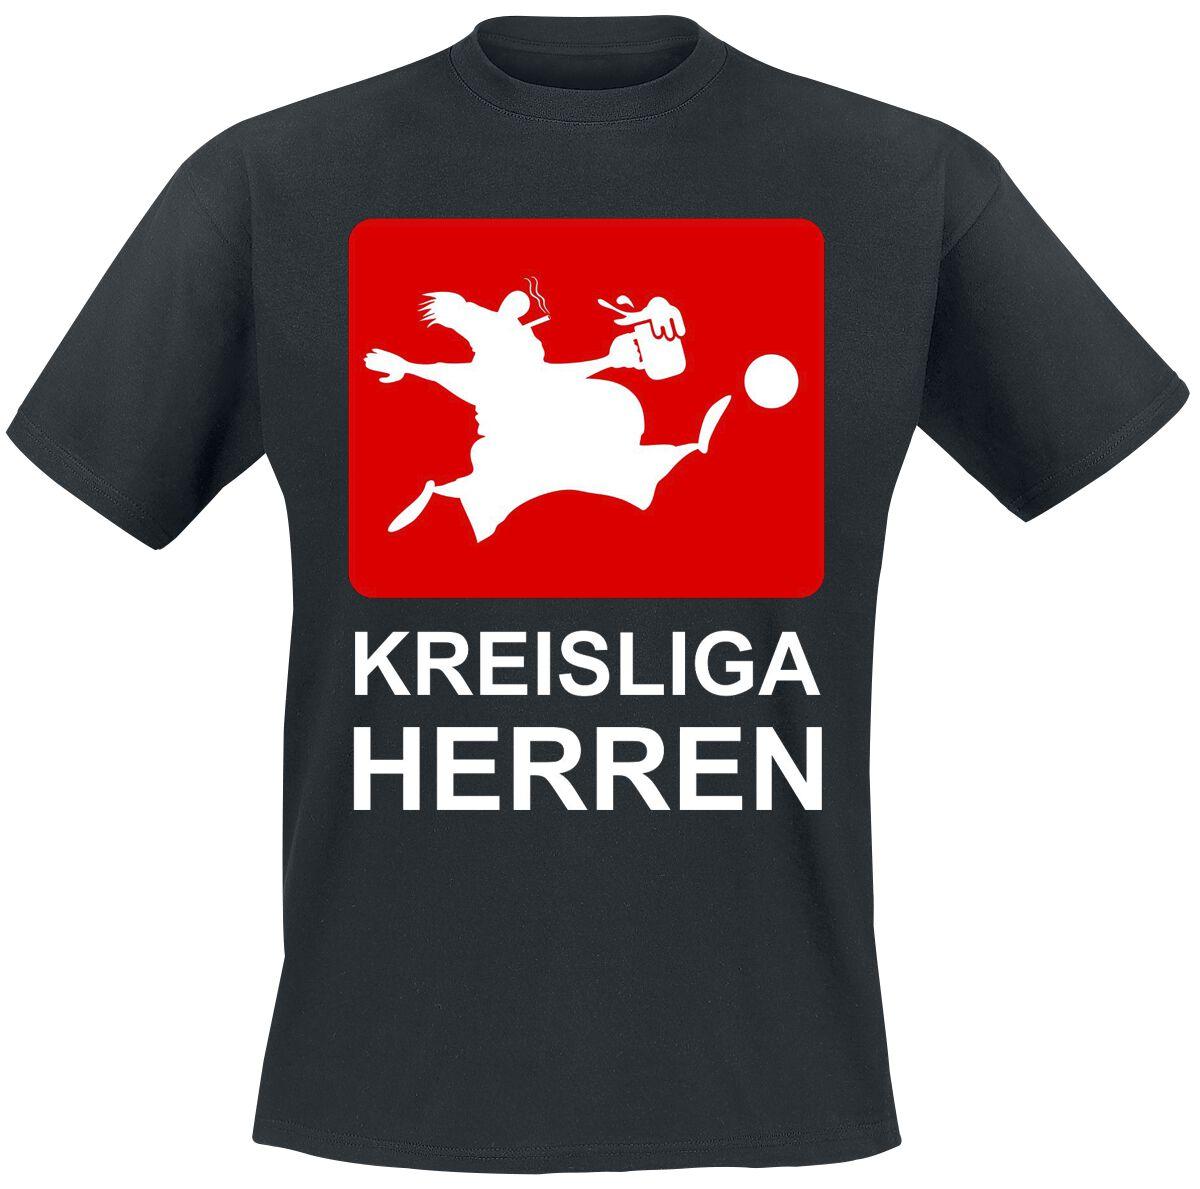 Kreisliga Herren T-Shirt schwarz POD - BY083 - 5360